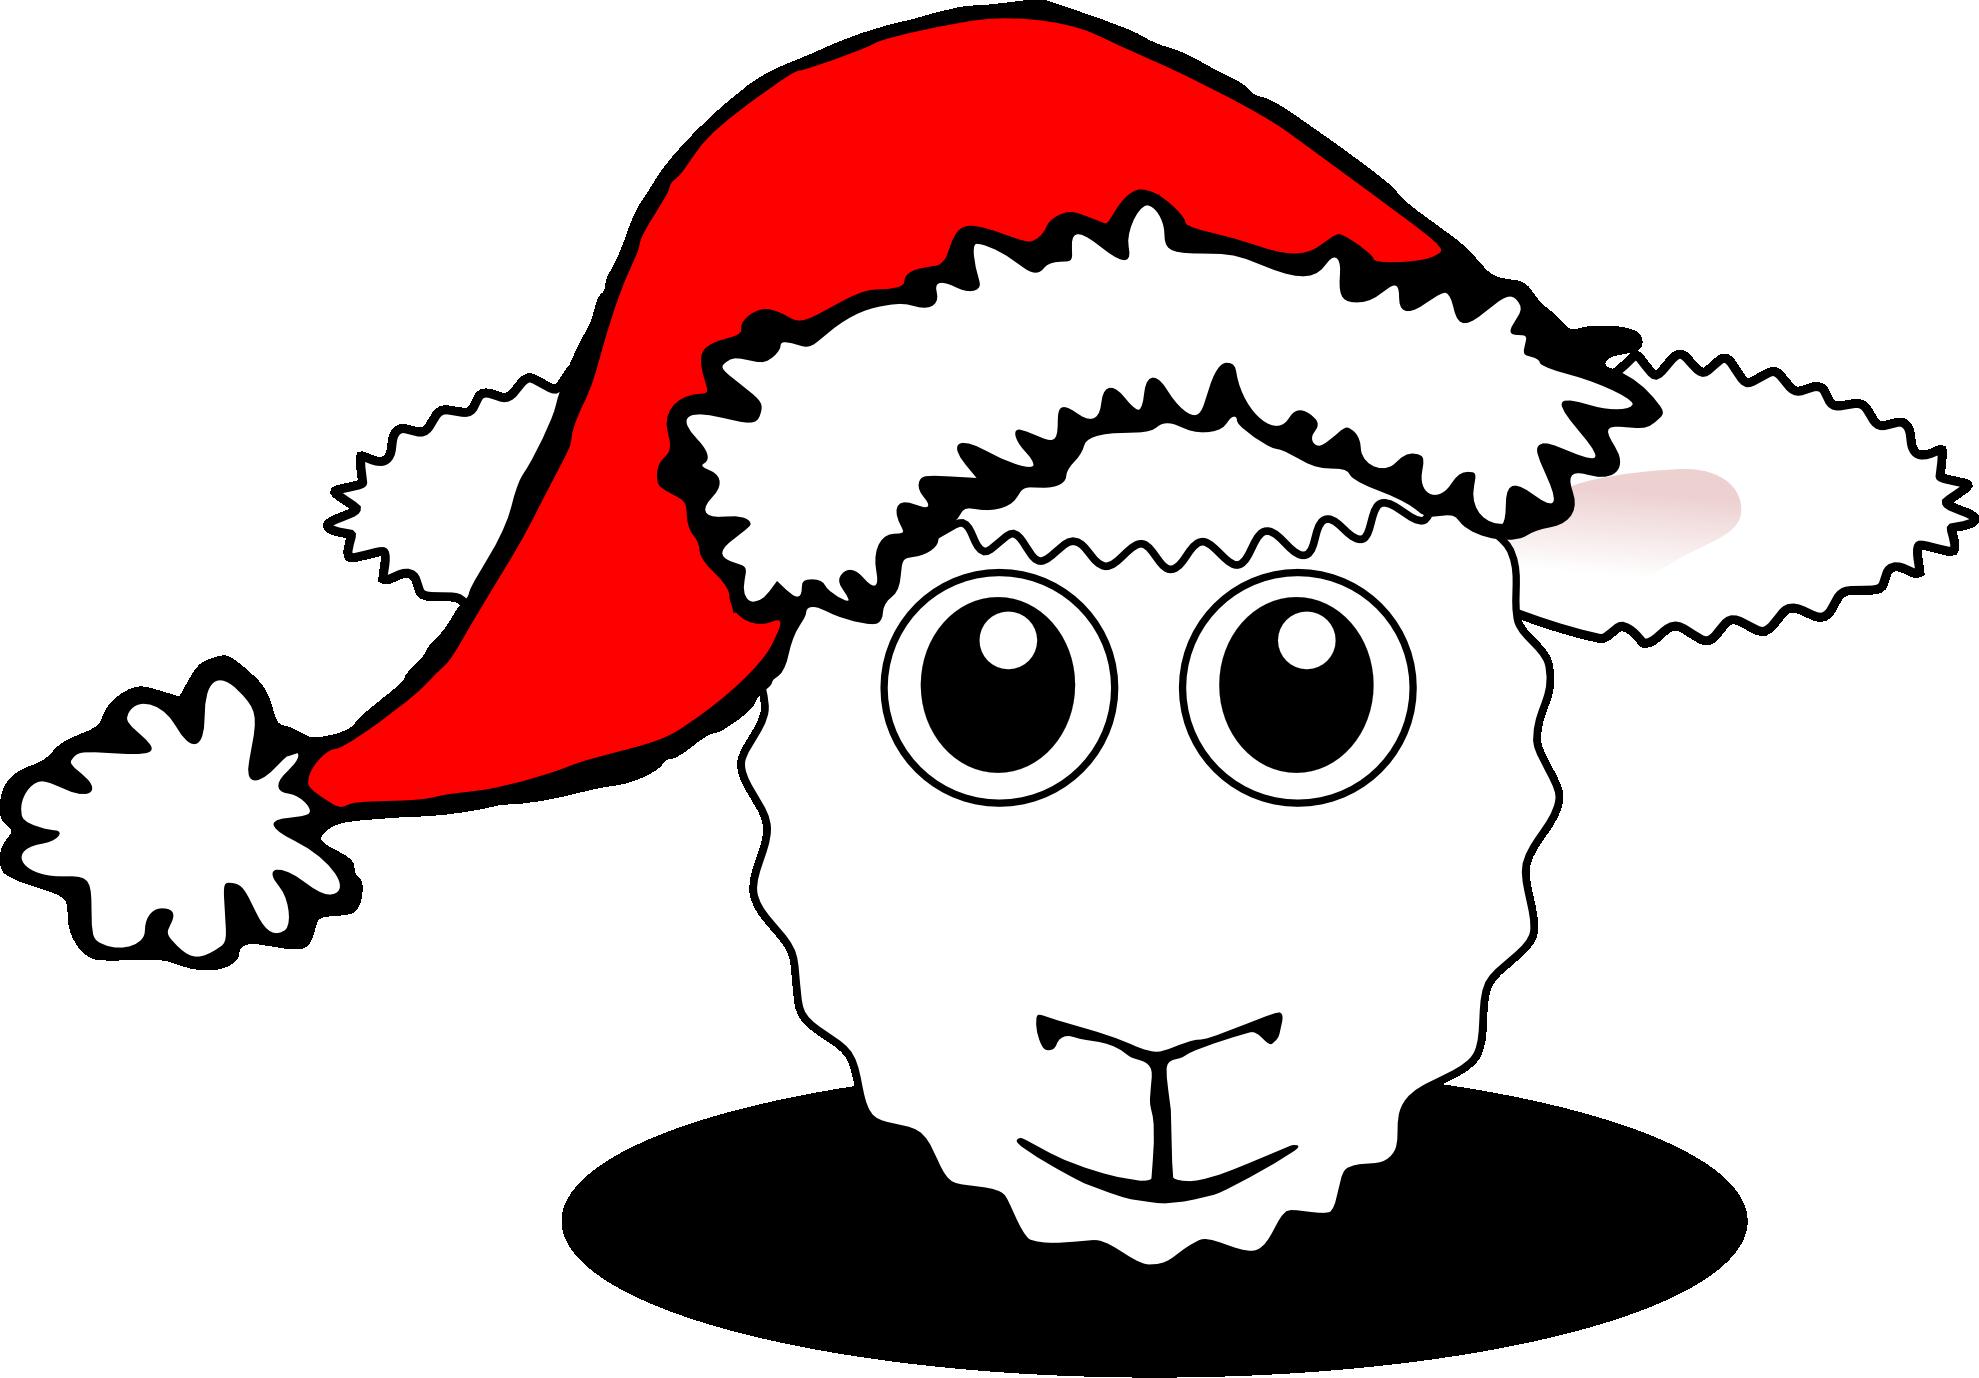 Sheep head black and. Walrus clipart christmas